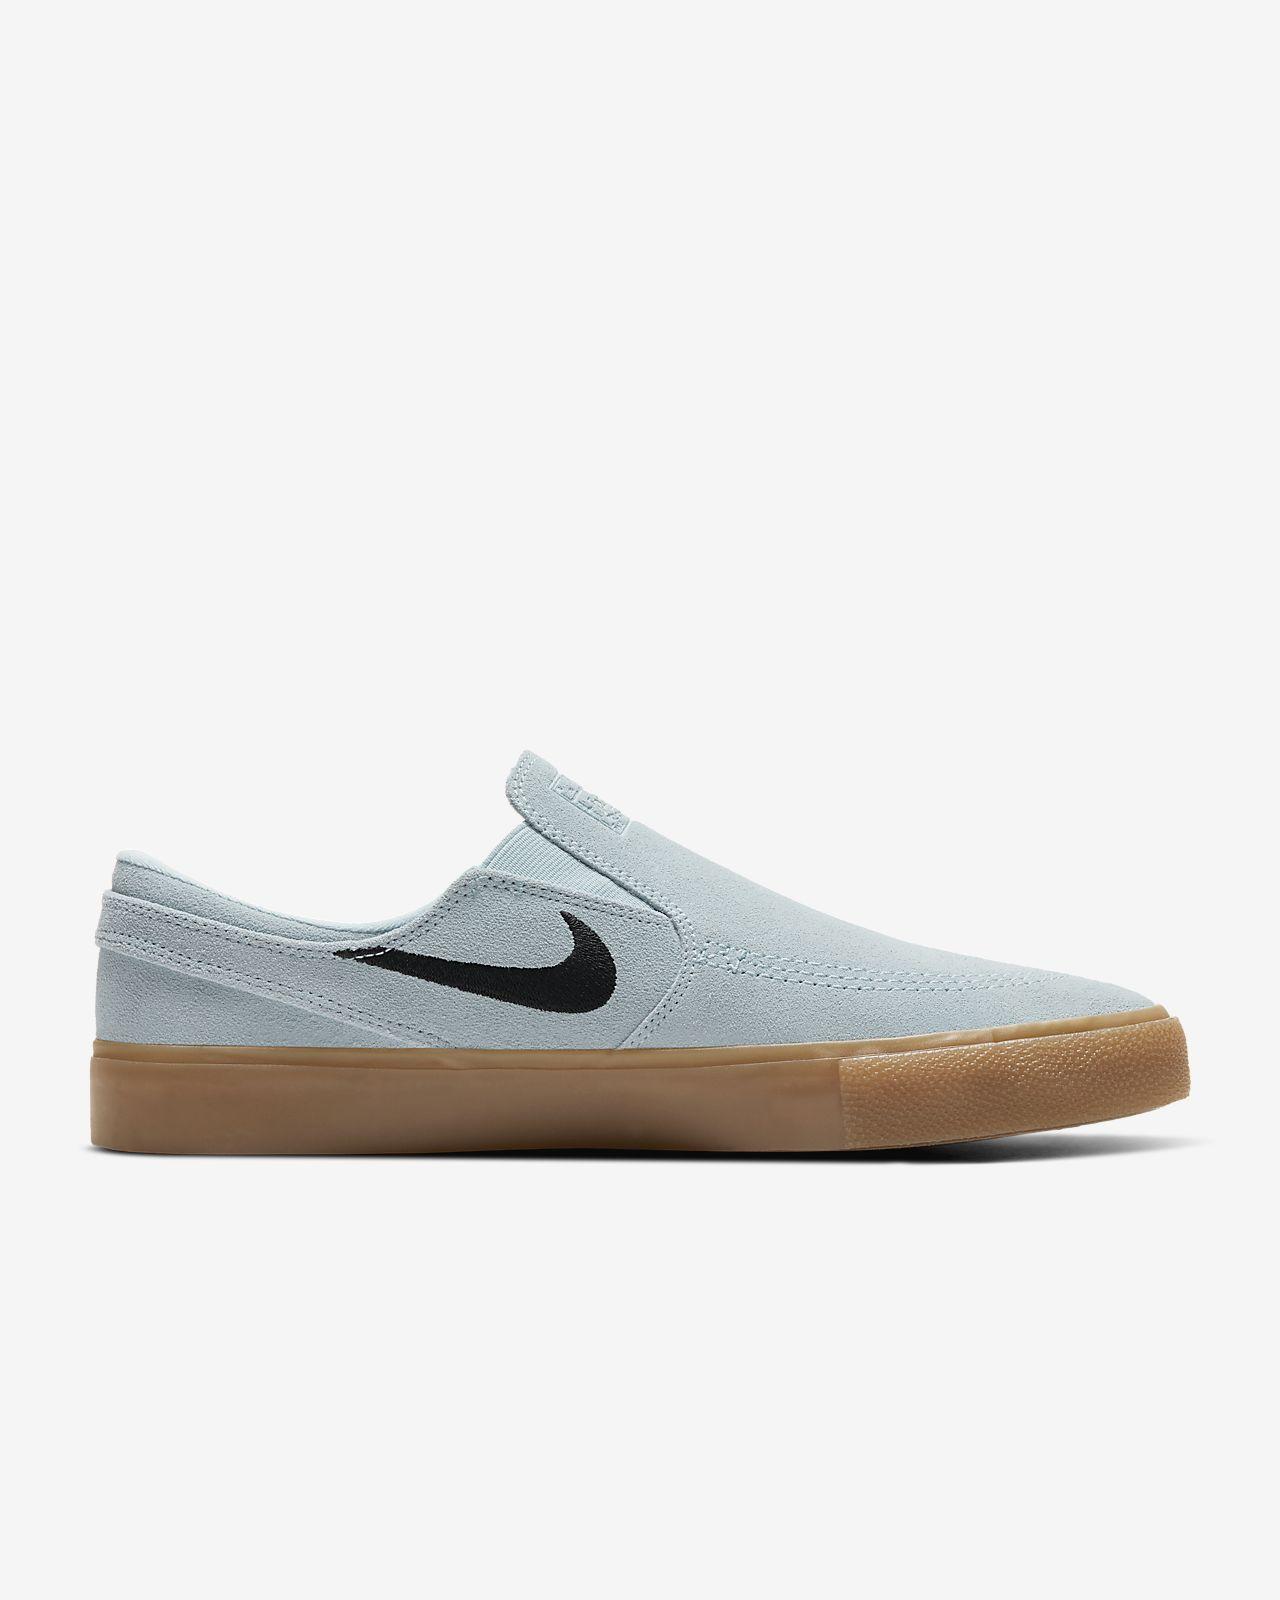 Nike SB Zoom Janoski Slip RM Schuh (light armory blue black)